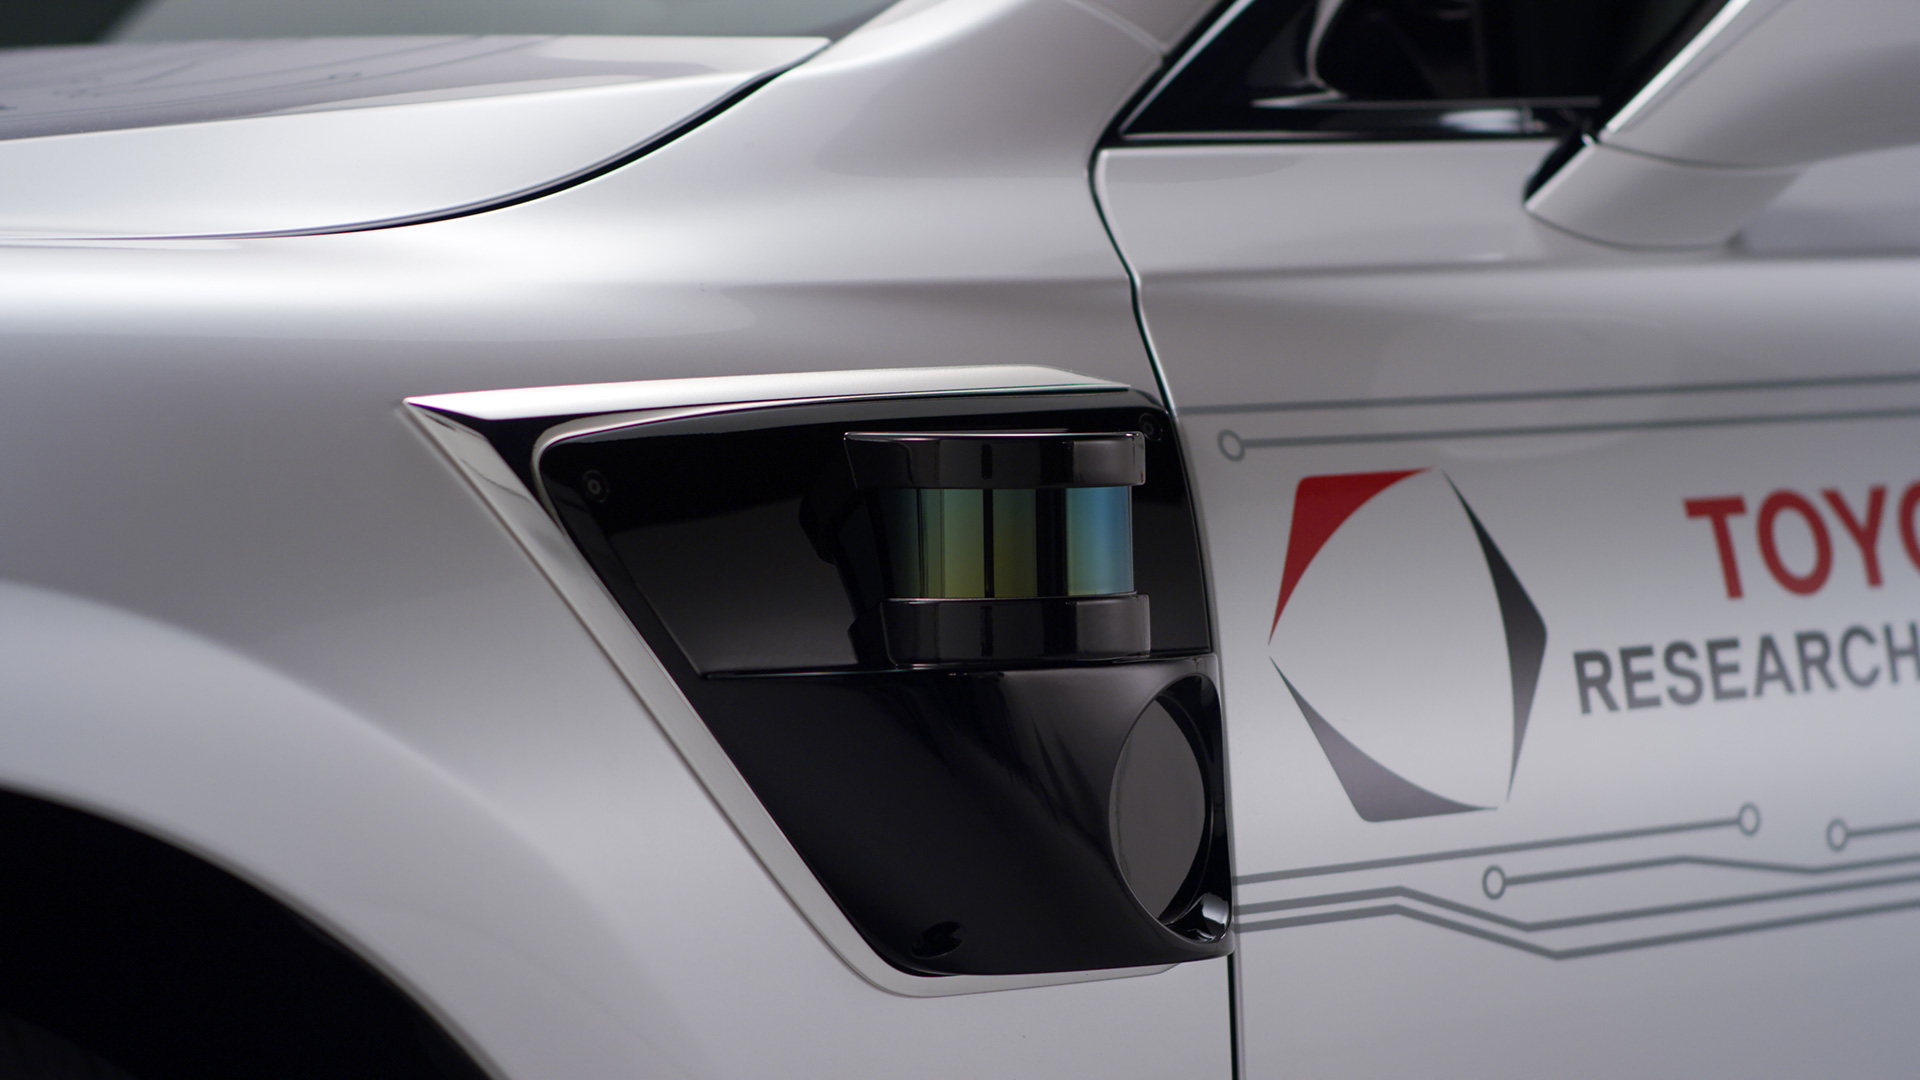 「【CES 2019】新型レクサスLSをベースとした自動運転実験車「TRI-P4」を披露」の3枚目の画像